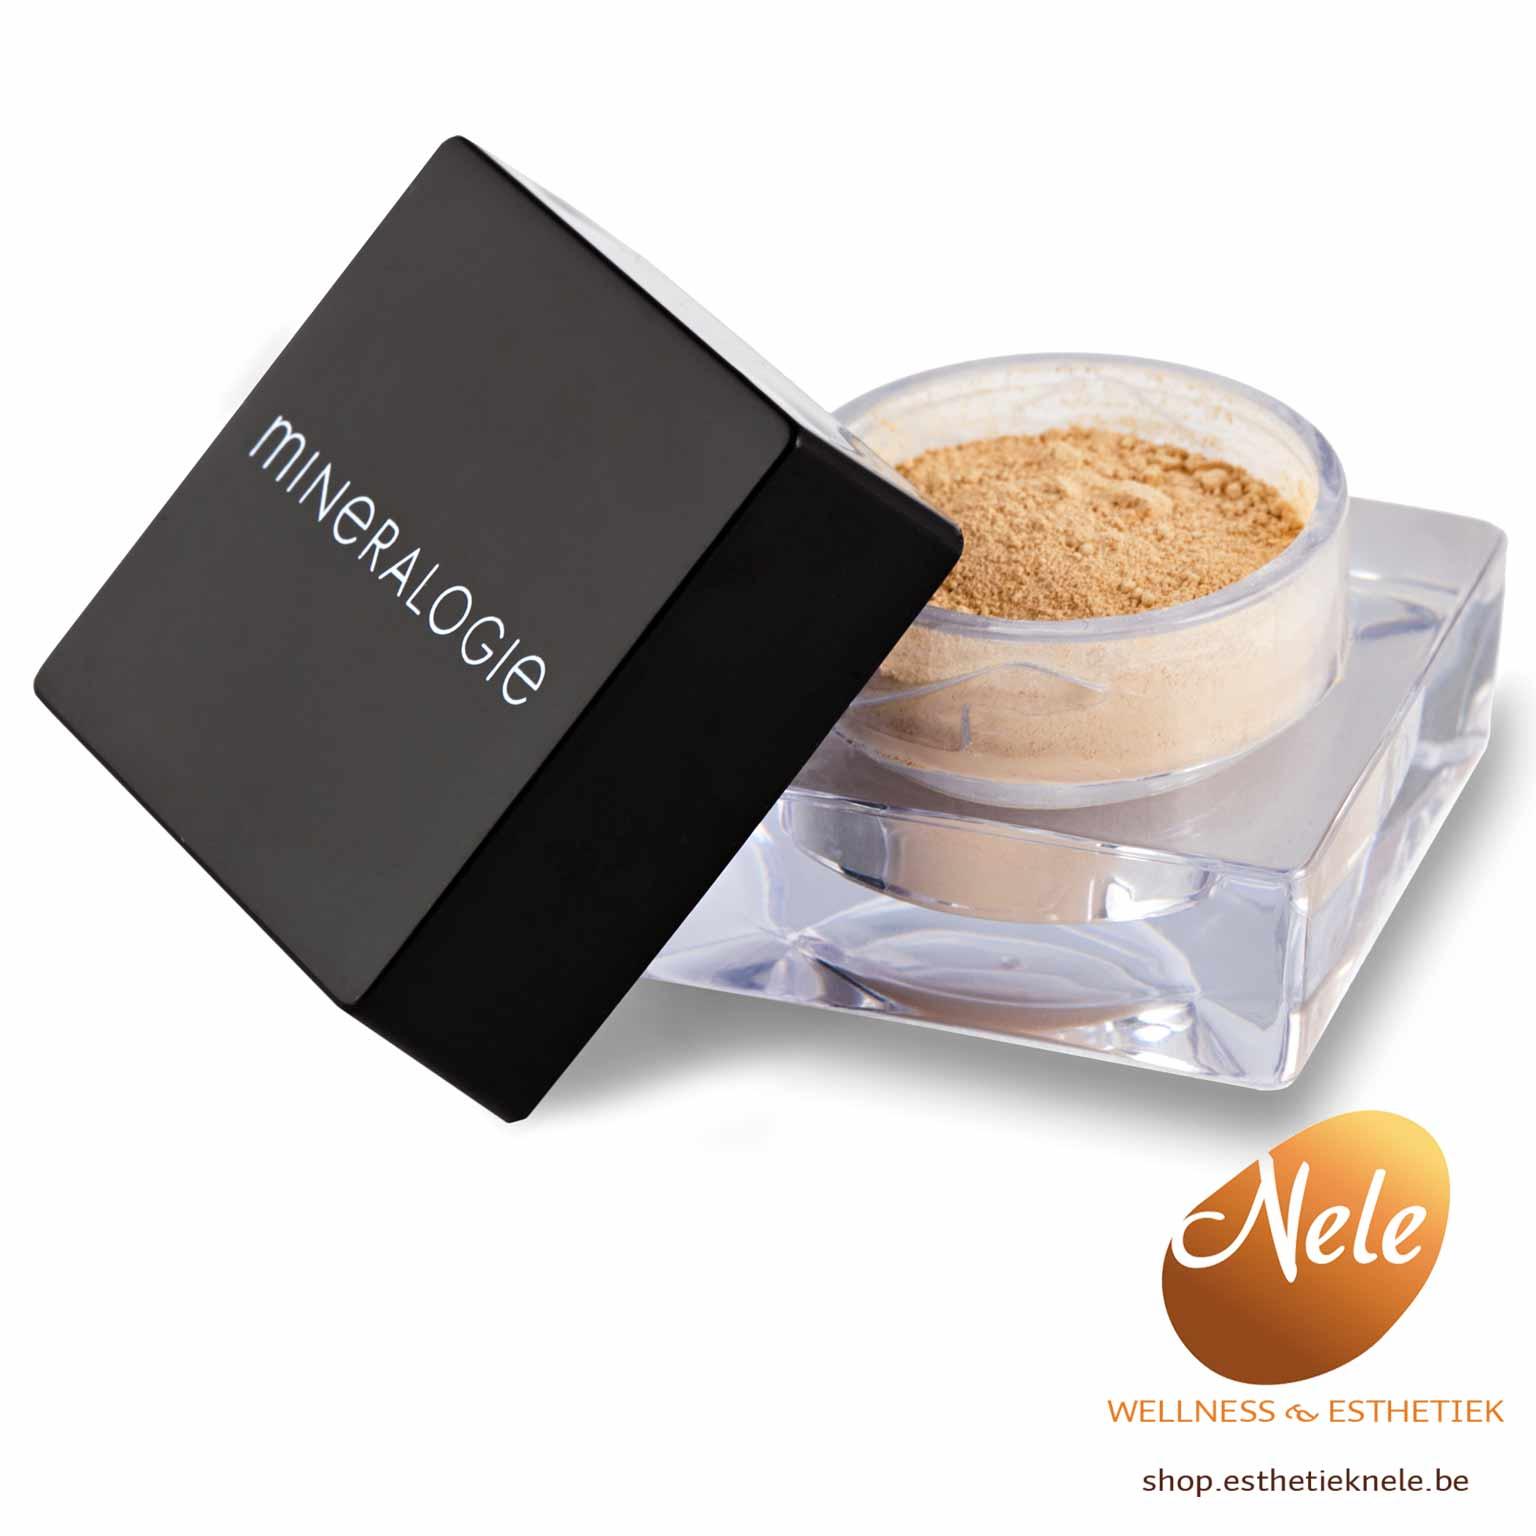 Mineralogie Minerale Make-up Losse Concealer Wellness Esthetiek Nele